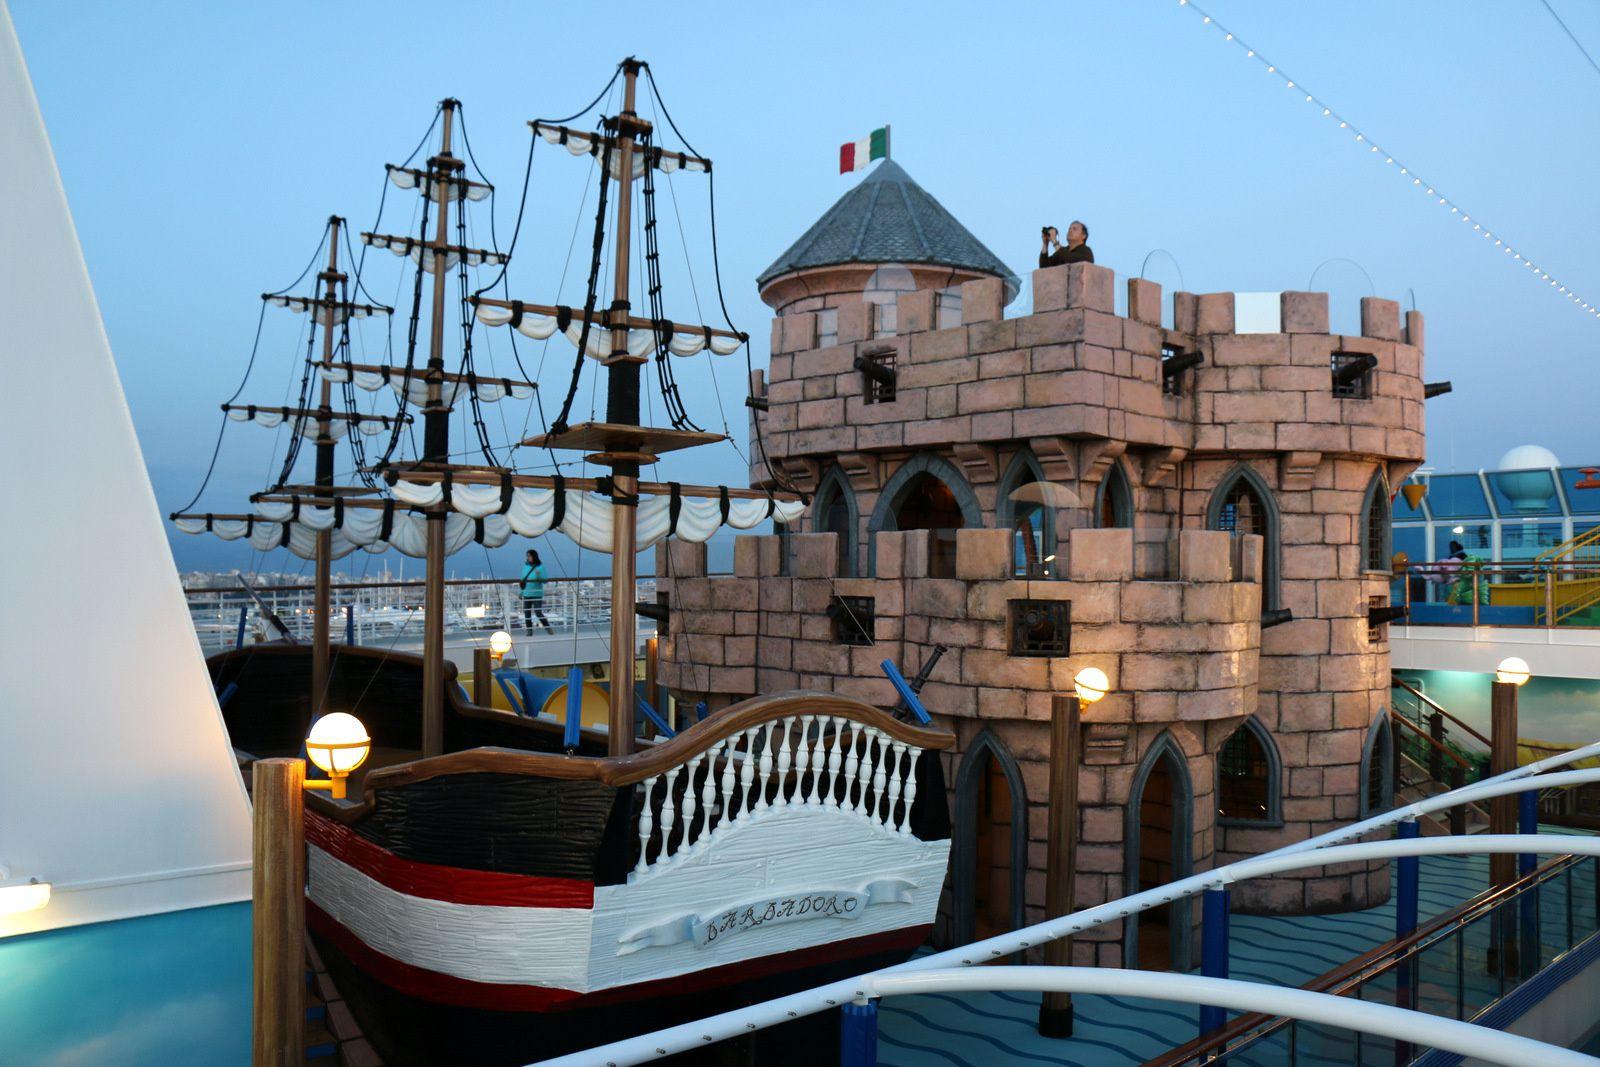 A bord du Costa Diadema, le galion et le château-fort